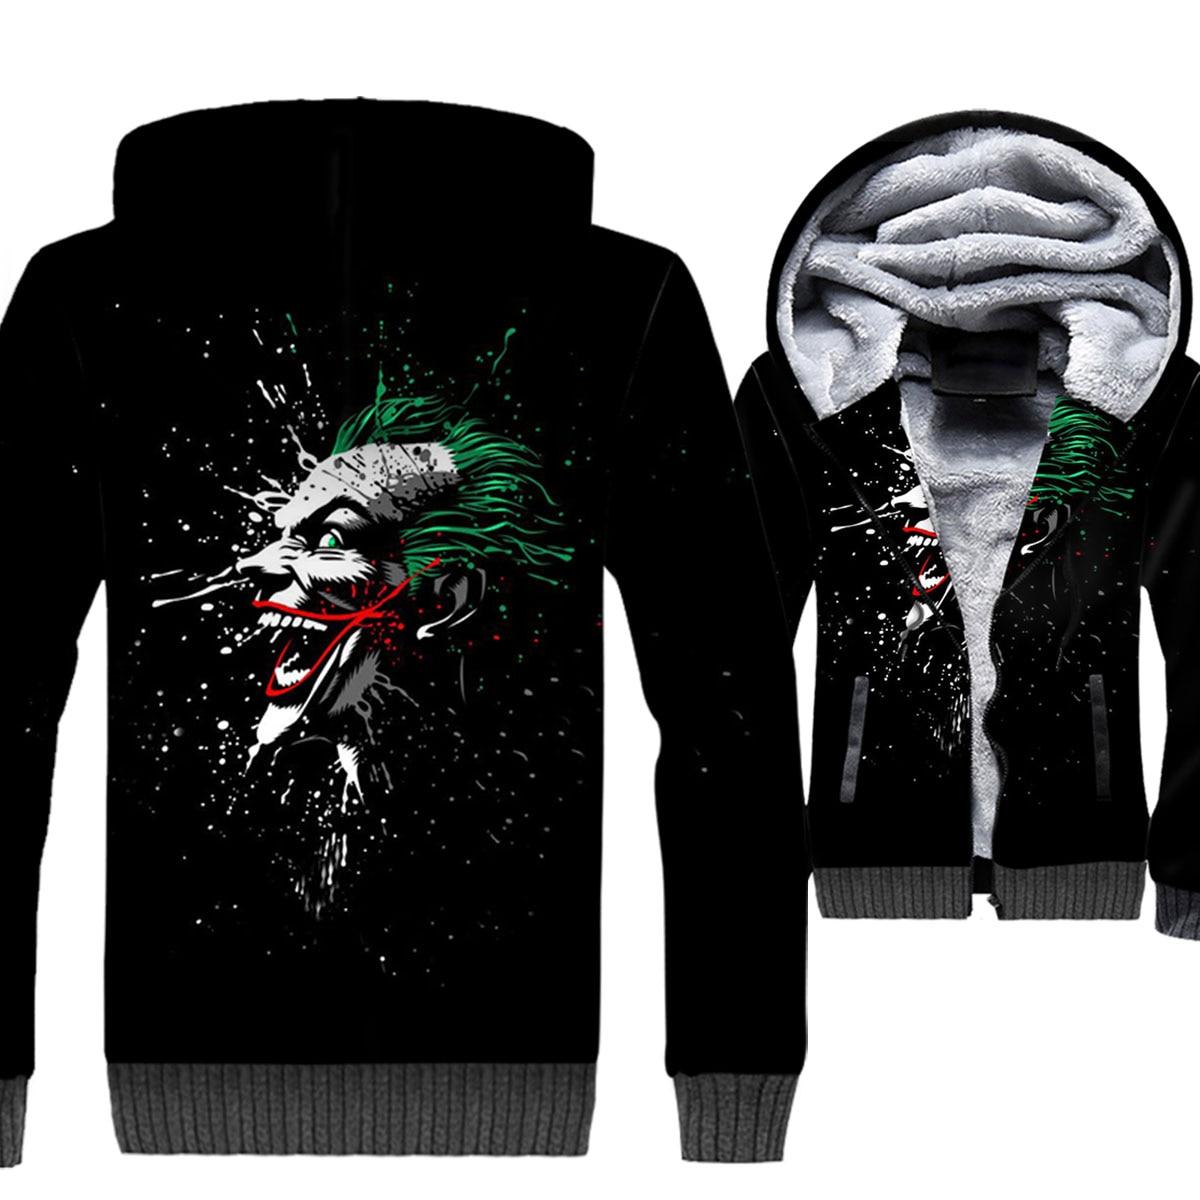 New Hot Clown Jacket Male 2019 Winter Thick Hoodie Hip Hop Zipper Anime Jackets Streetwear Unisex 3D Print Tracksuit Gothic Coat